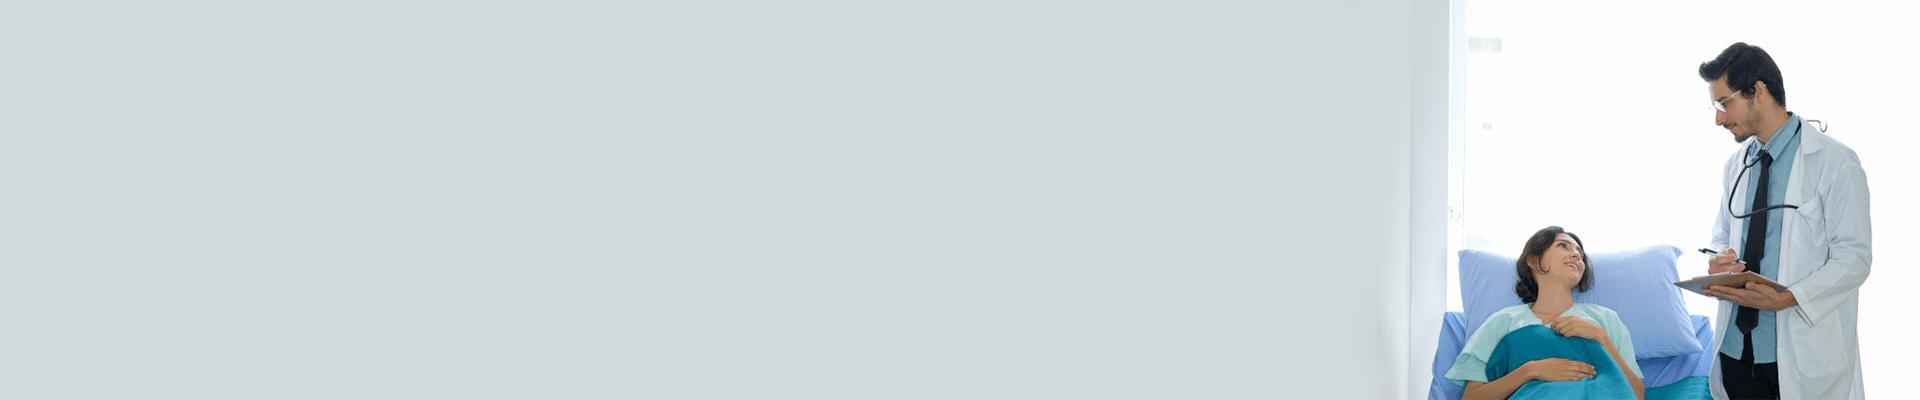 [:fr]Séjour chirurgie esthétique médiale à Nabeul Hammamet[:ar]الإقامة الجراحية التجميلية في نابل و الحمامات[:]